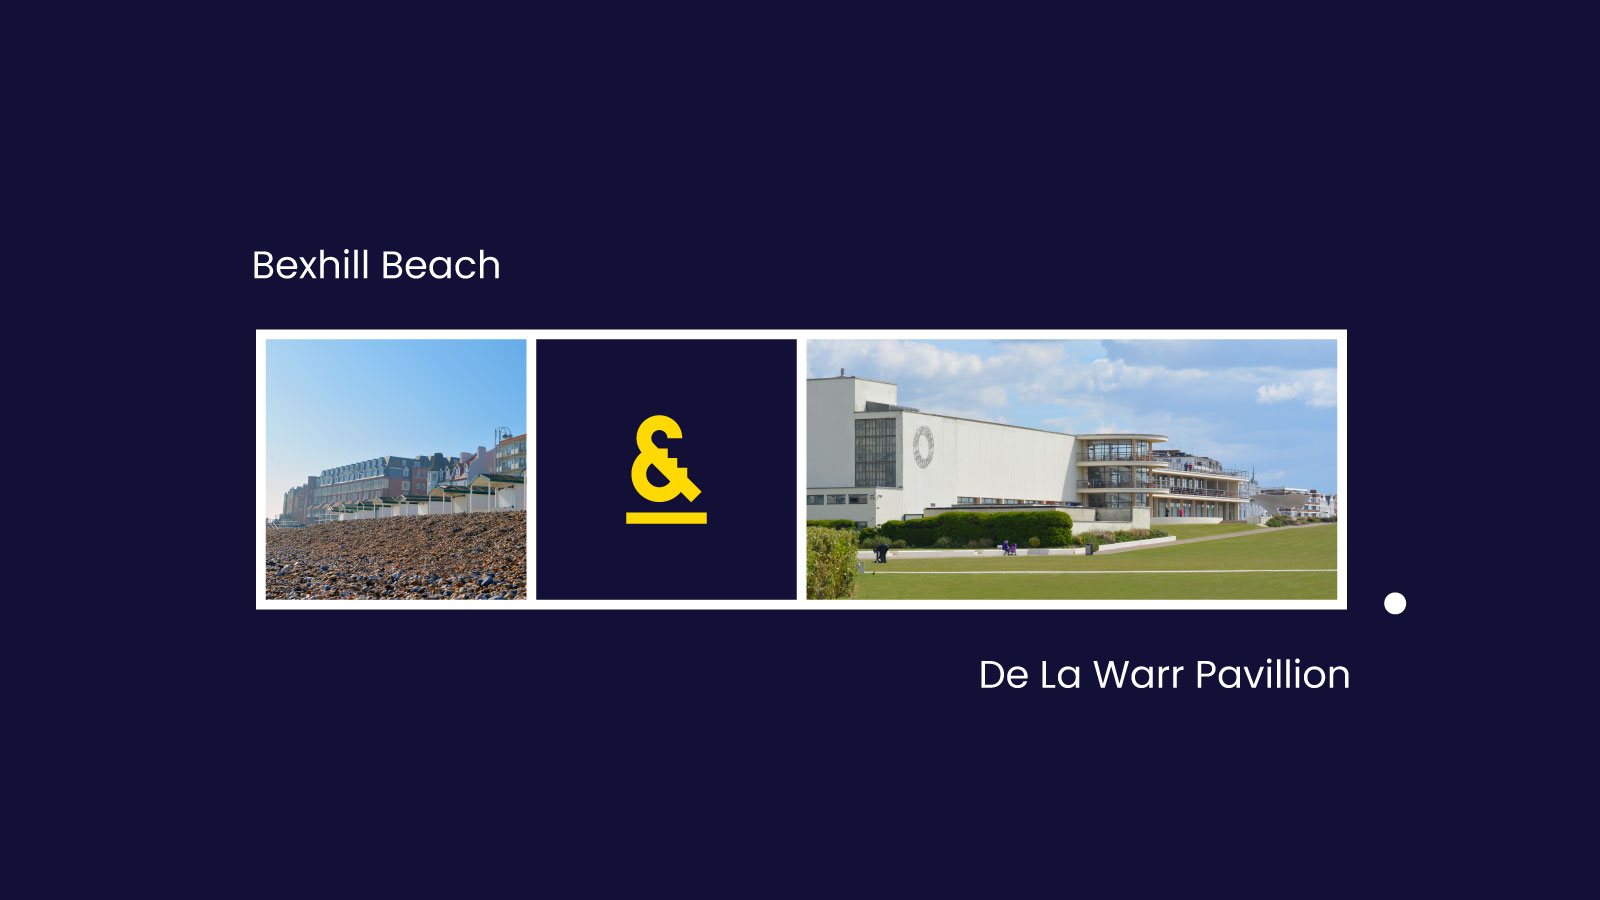 Brand identity graphic device showing the beach and De La Warr Pavillionl